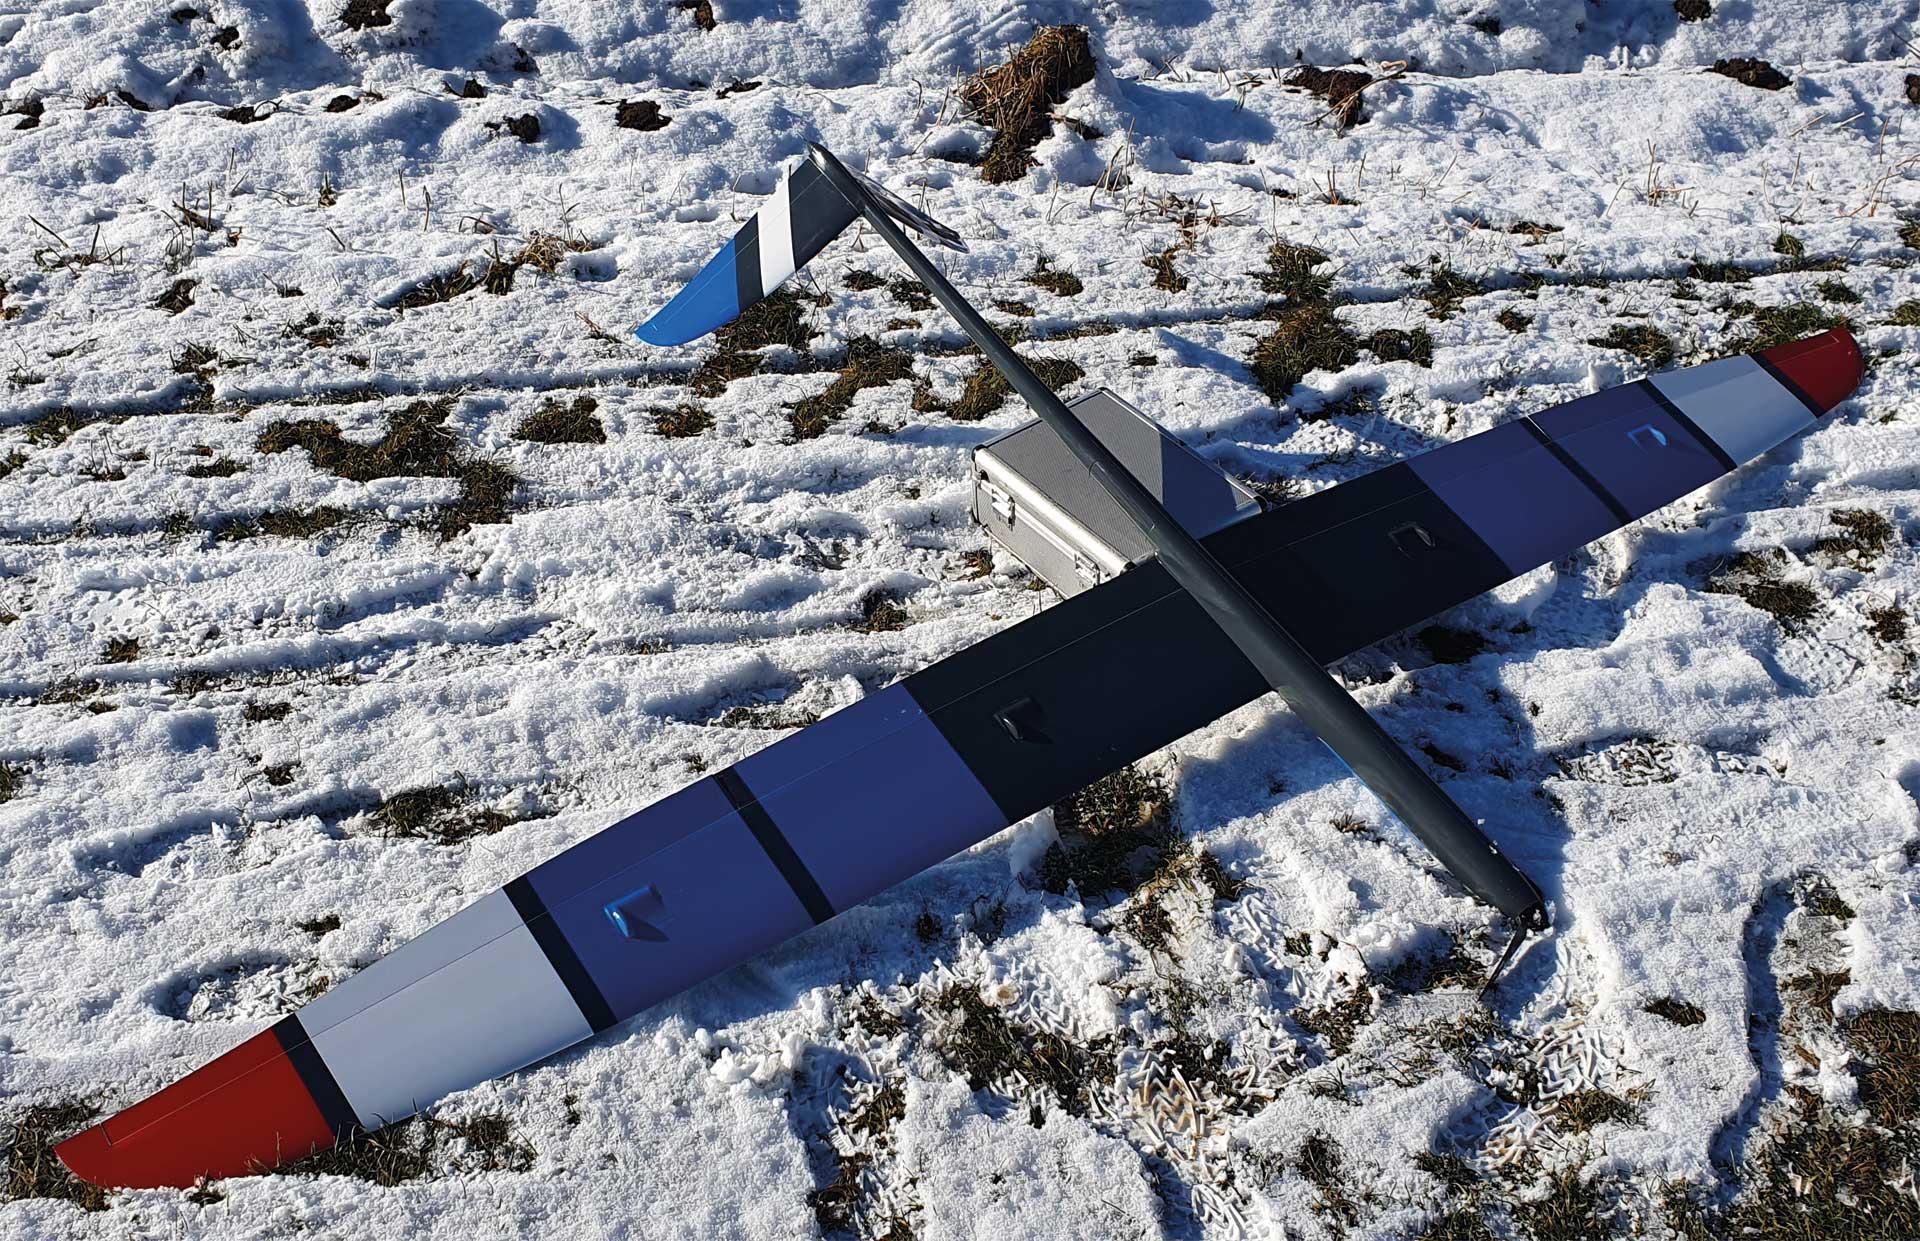 Robbe Modellsport AVALANCHE ARF FULL-GFK/CFK 2,8M ELECTRIC